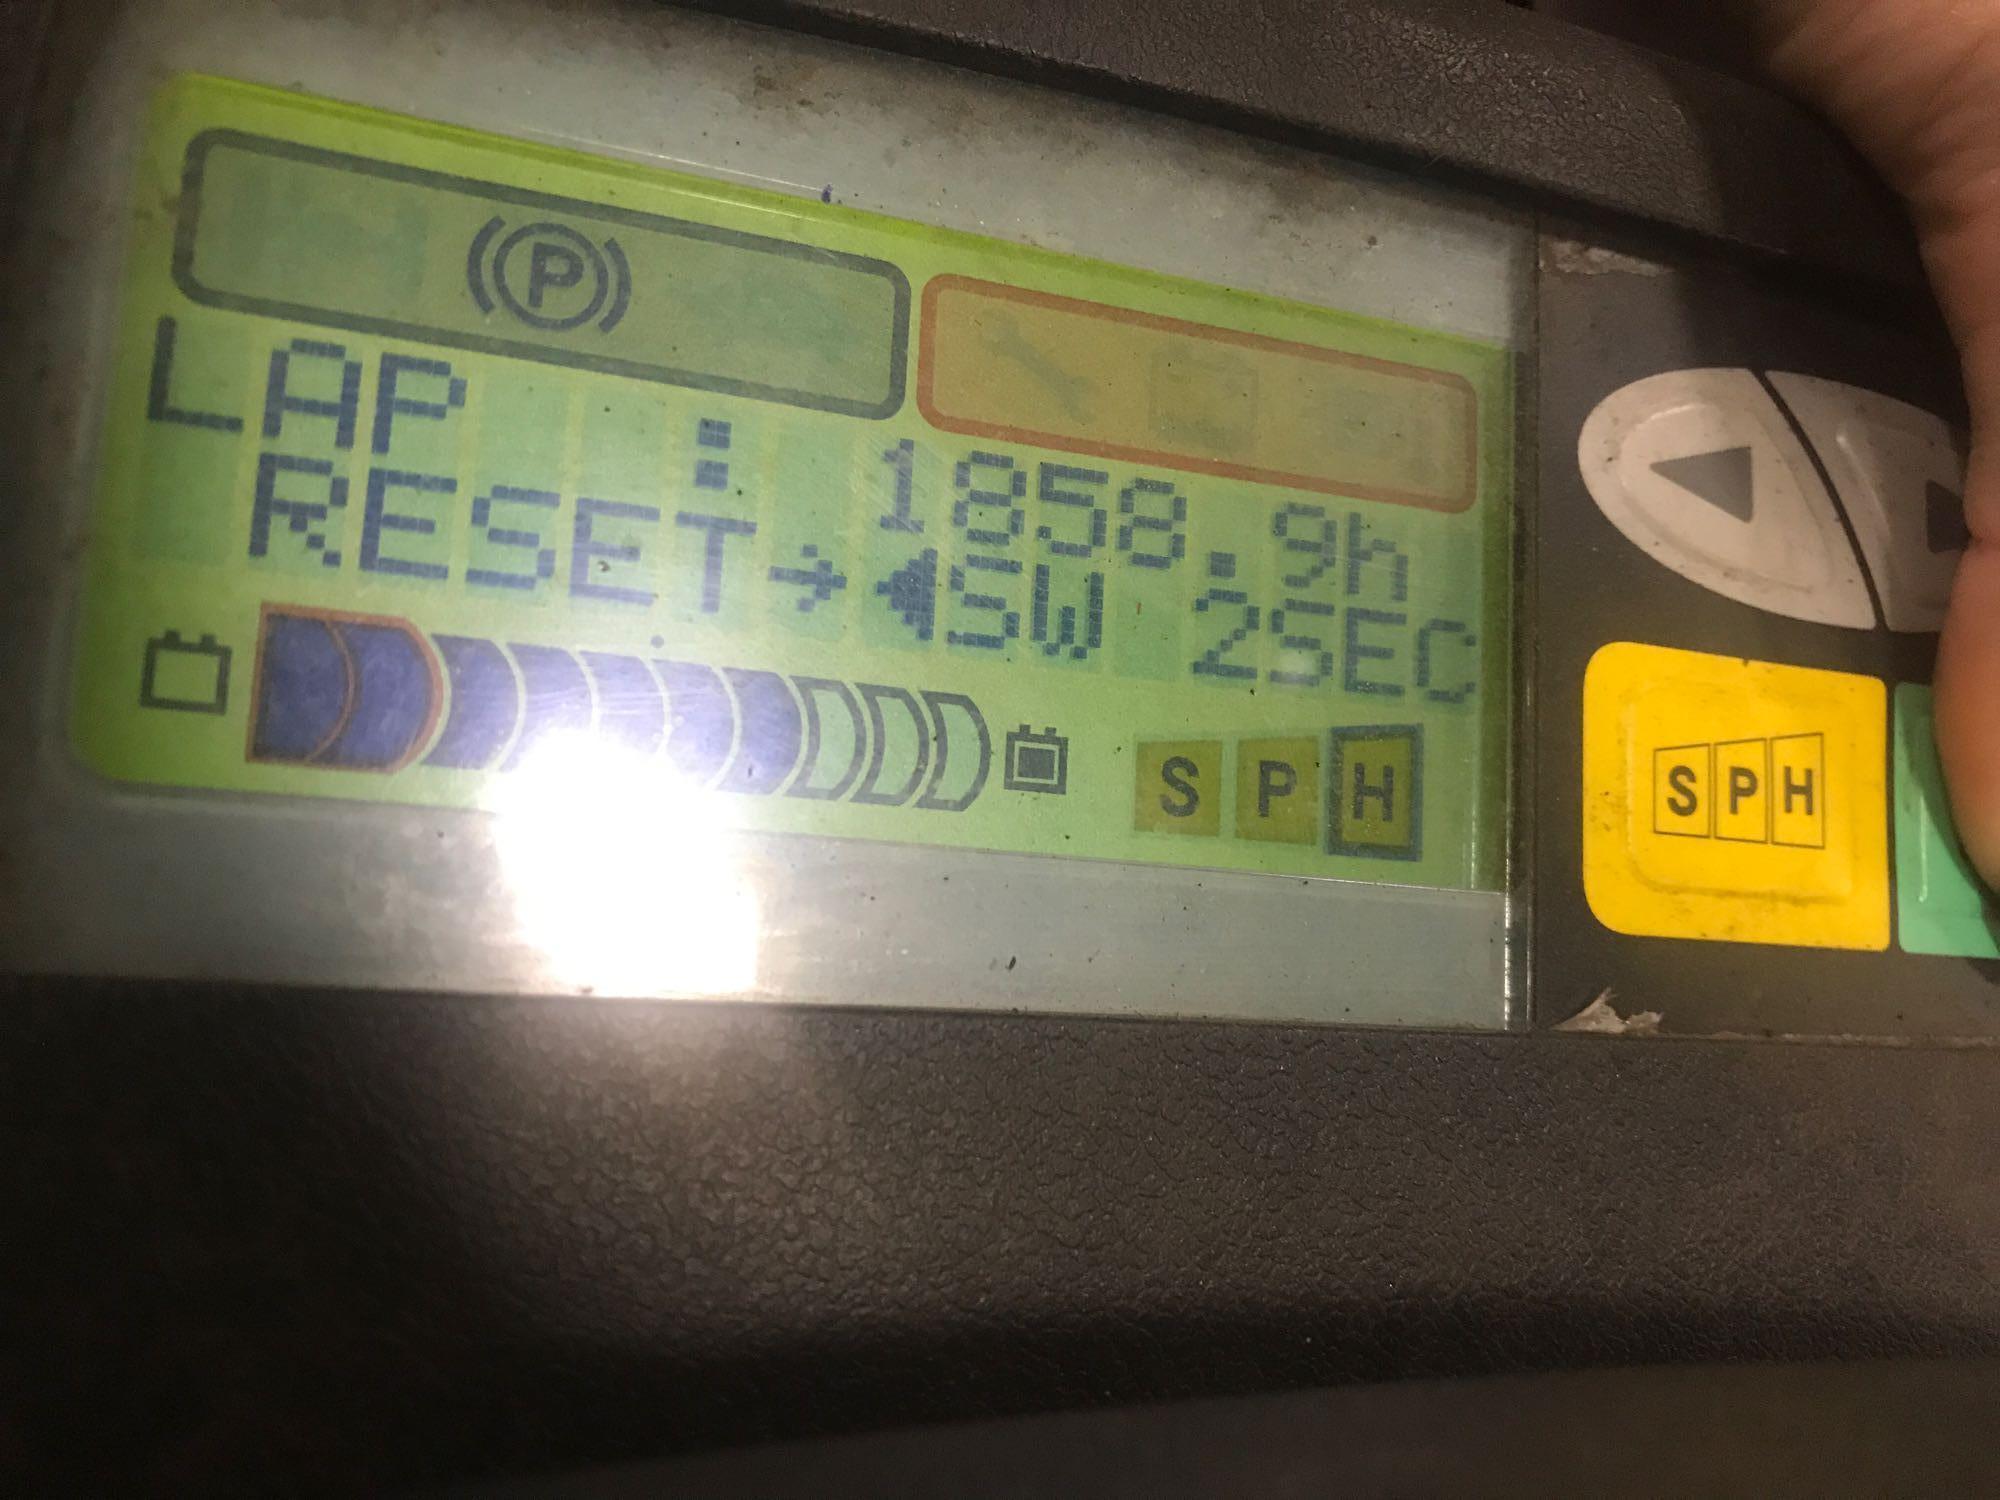 Lot 37 - 2013 TOYOTA 7FBEU15 ELECTRIC FORKLIFT, 3,000 LB LIFT CAPACITY, CLAMP ATTACHMENT